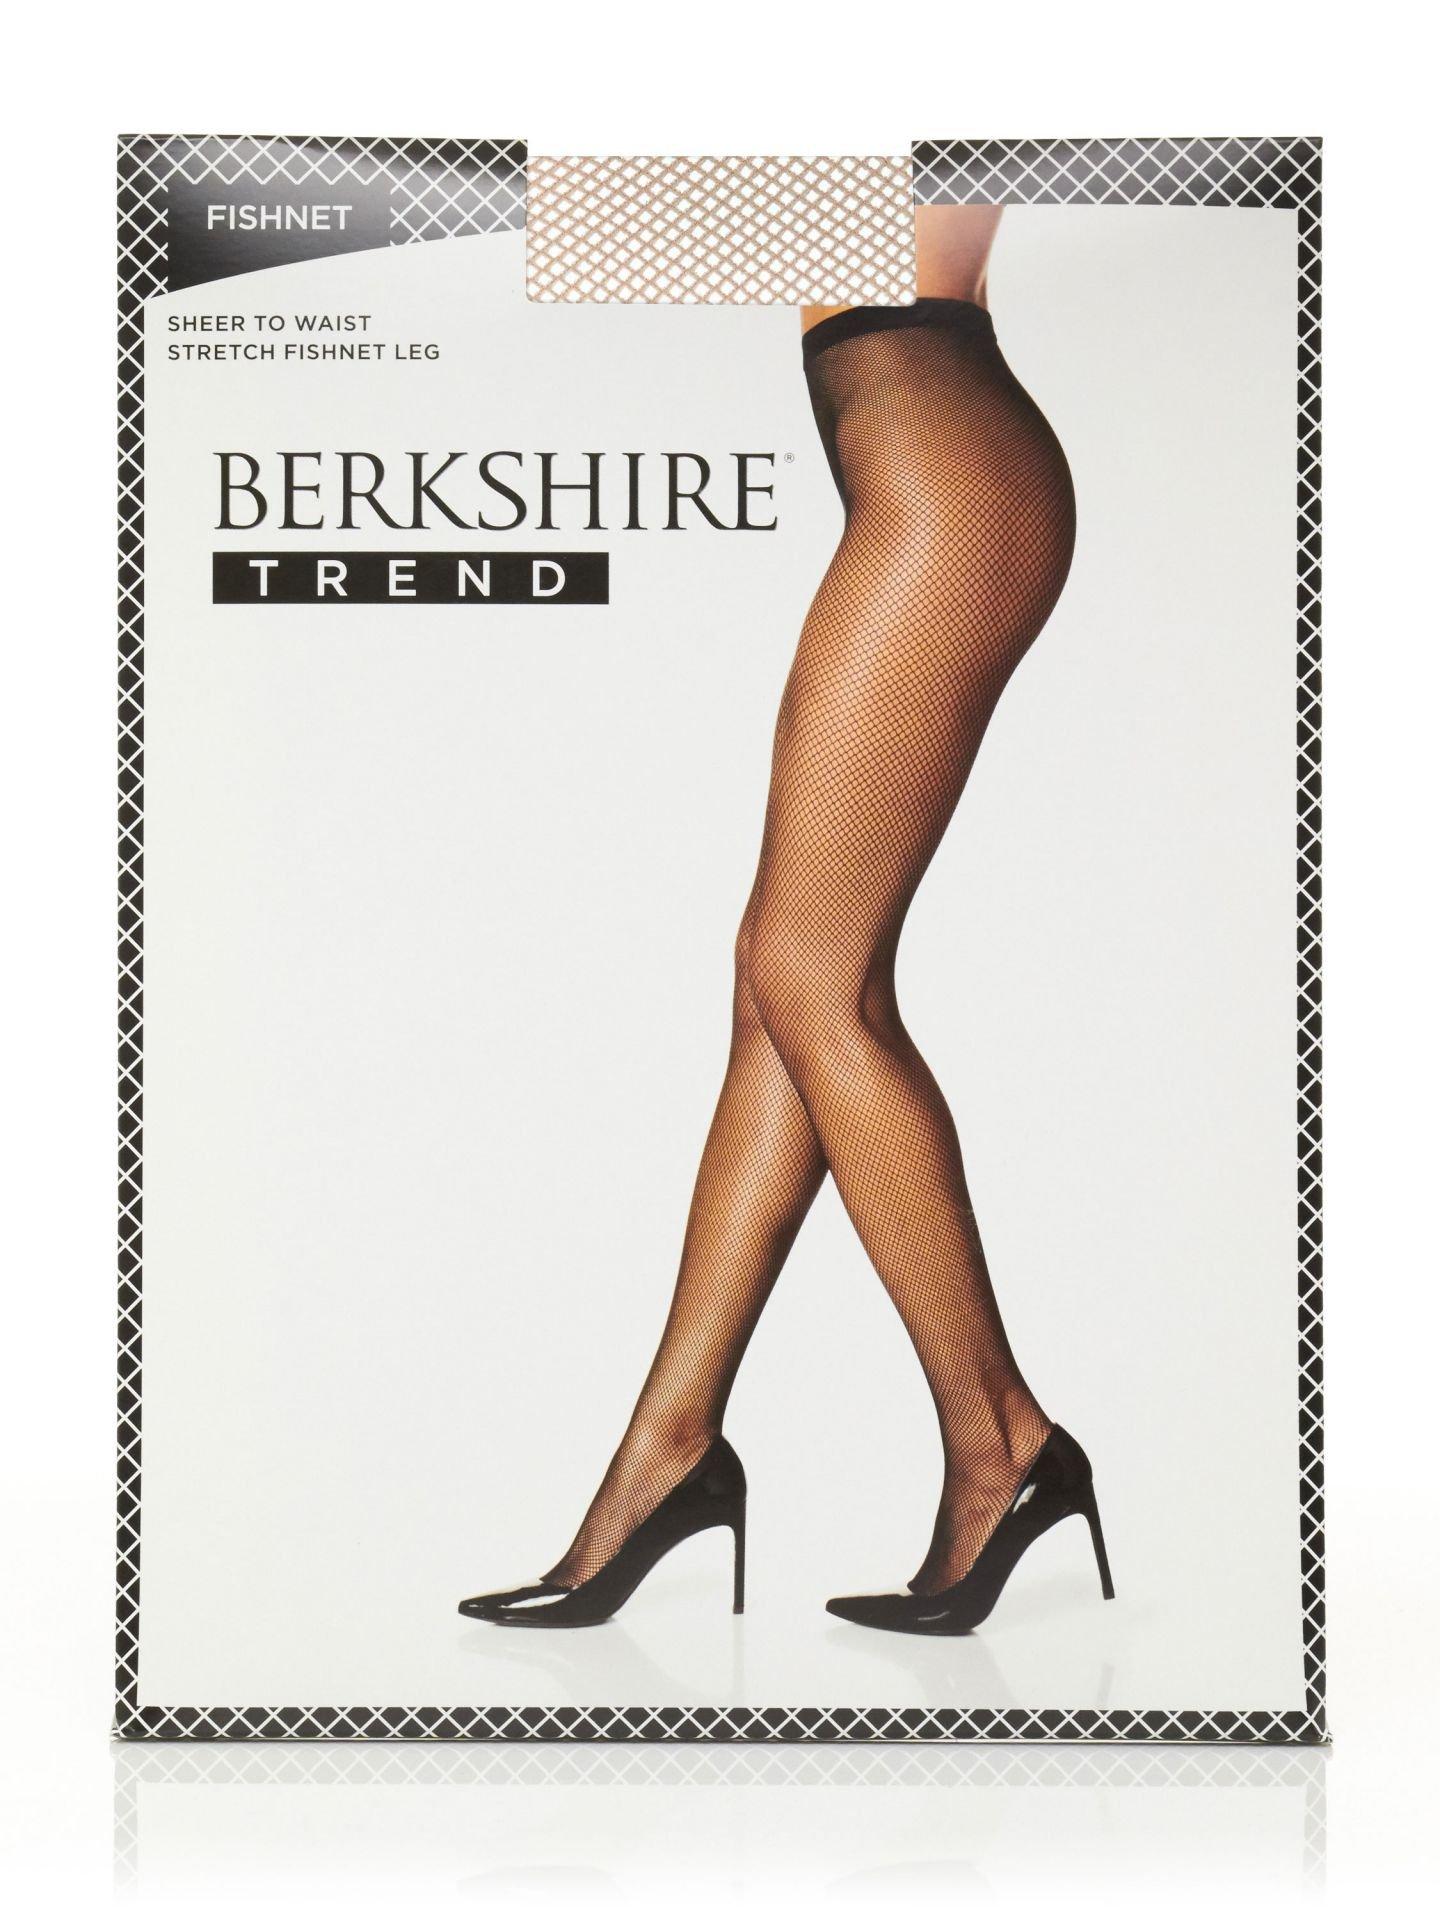 Berkshire Women's Fishnet Pantyhose, Nude, 1-2